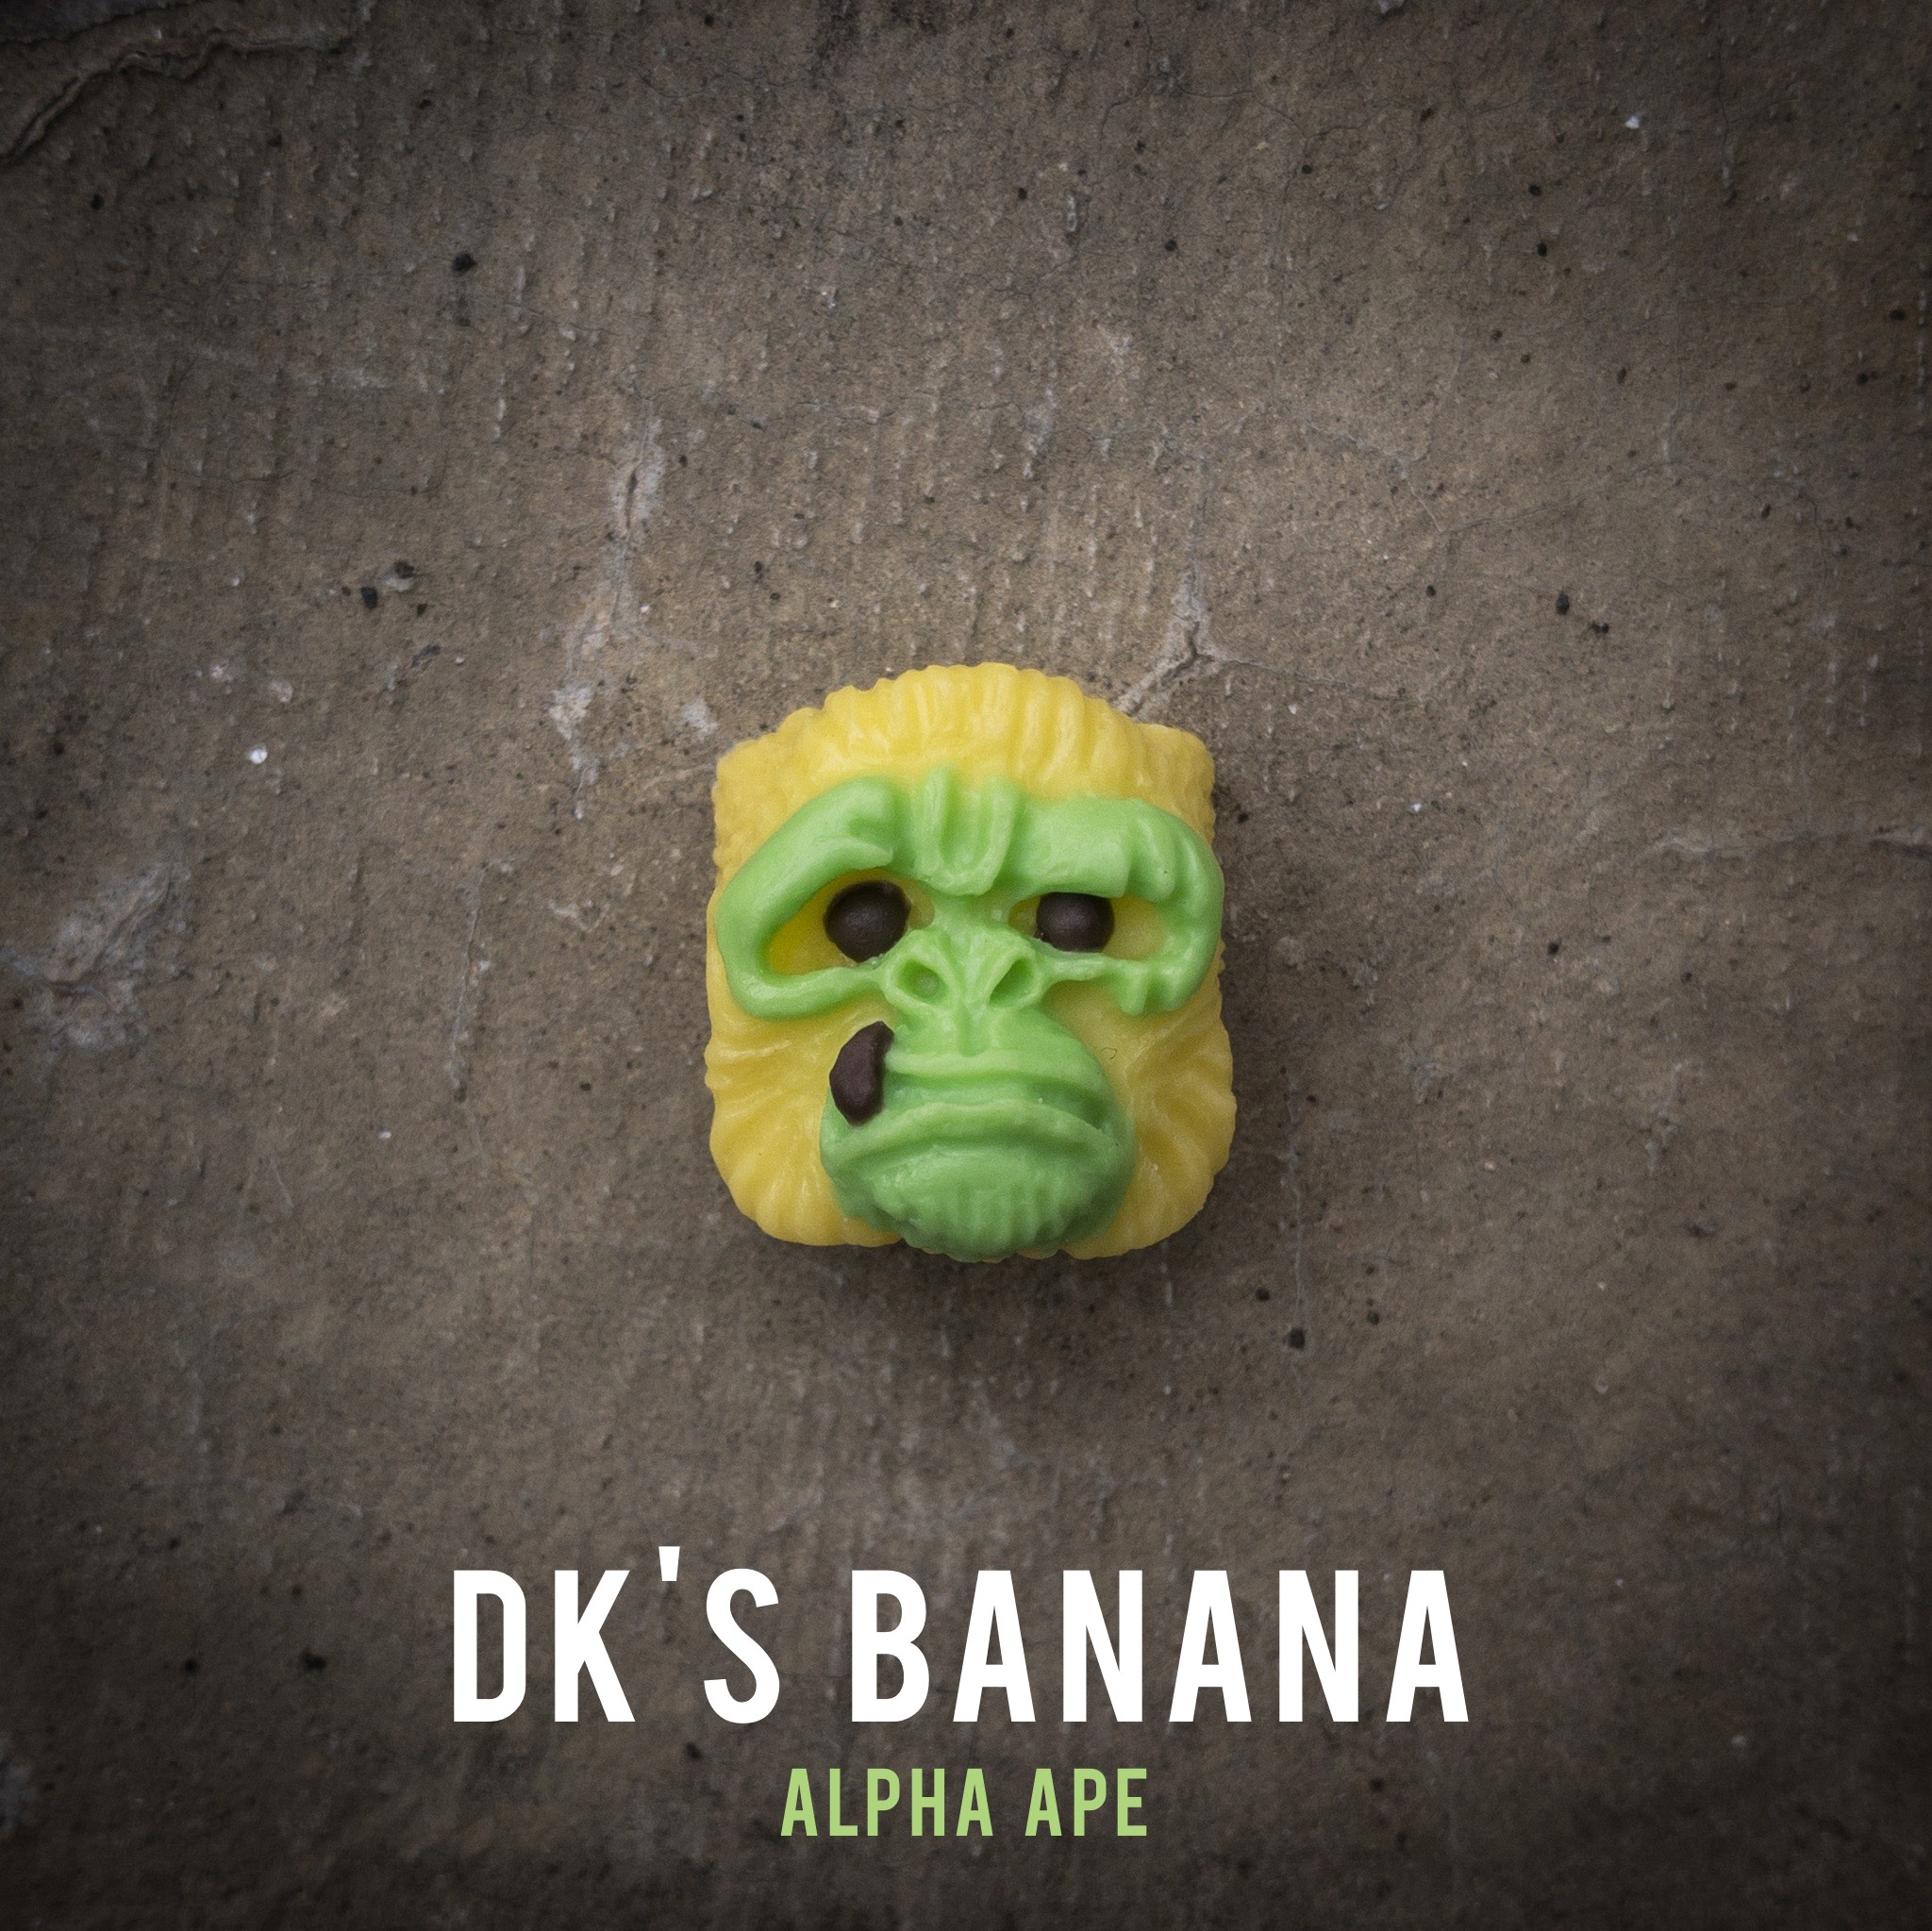 DK's Banana Alpha Ape